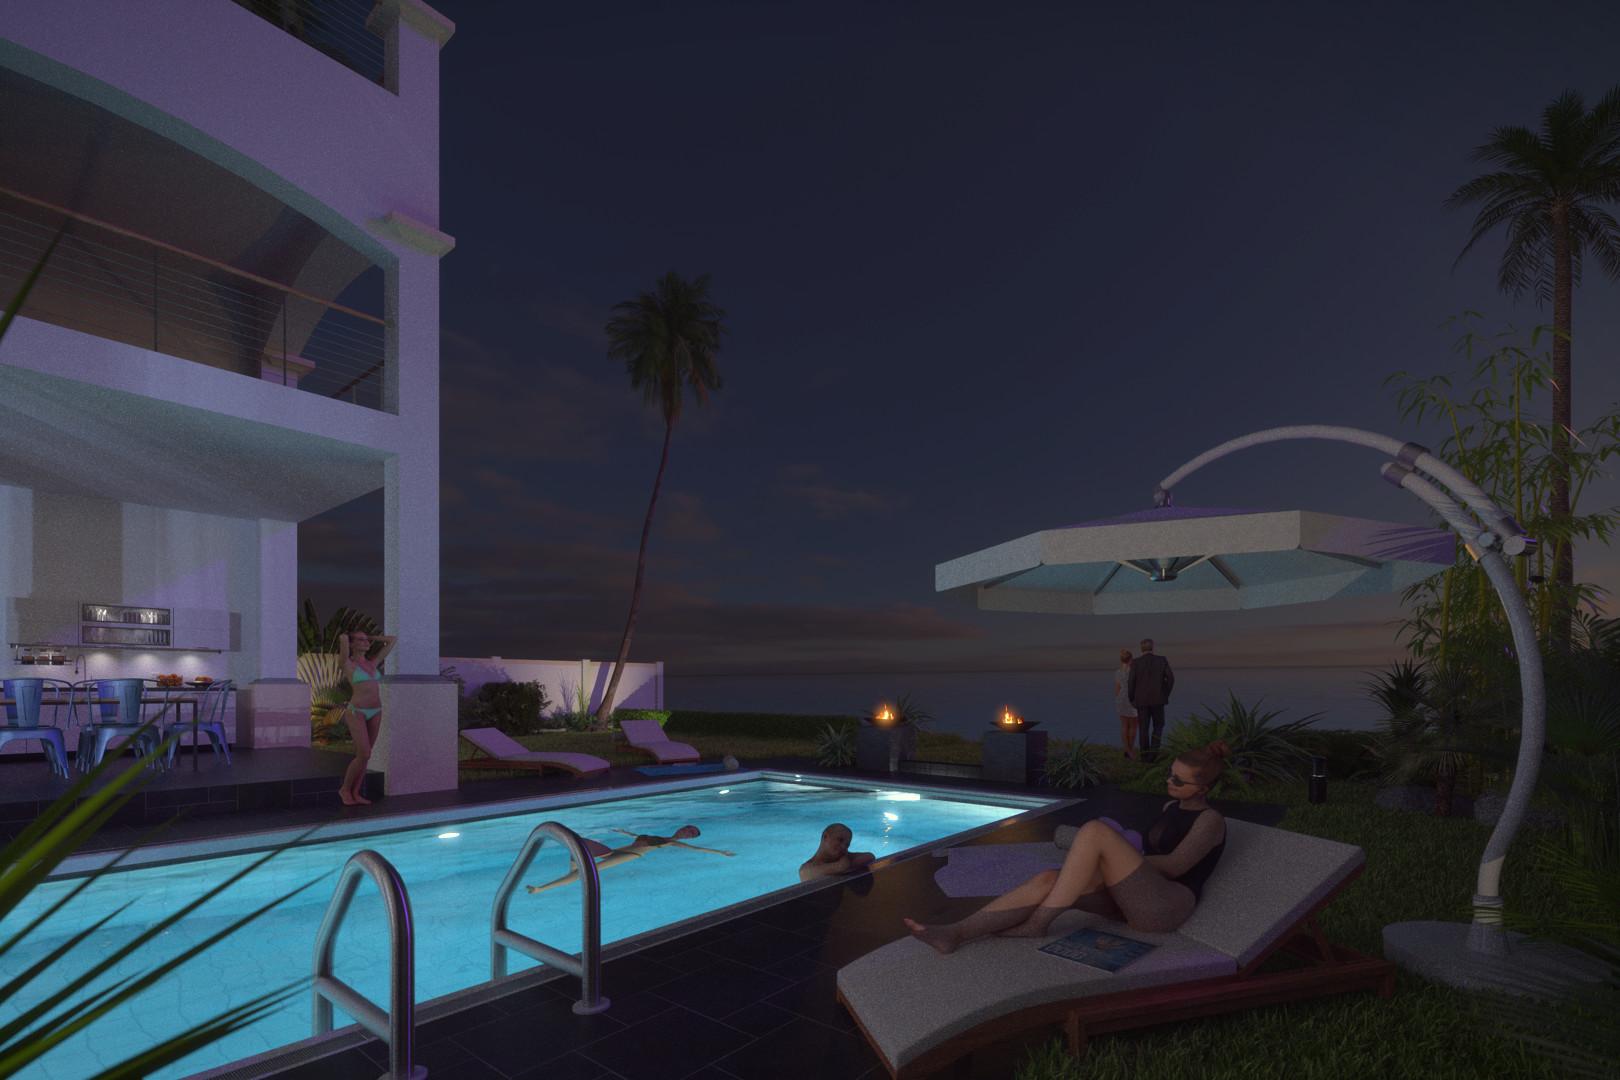 Duane kemp poolside 02 3 2 night a glare lumina